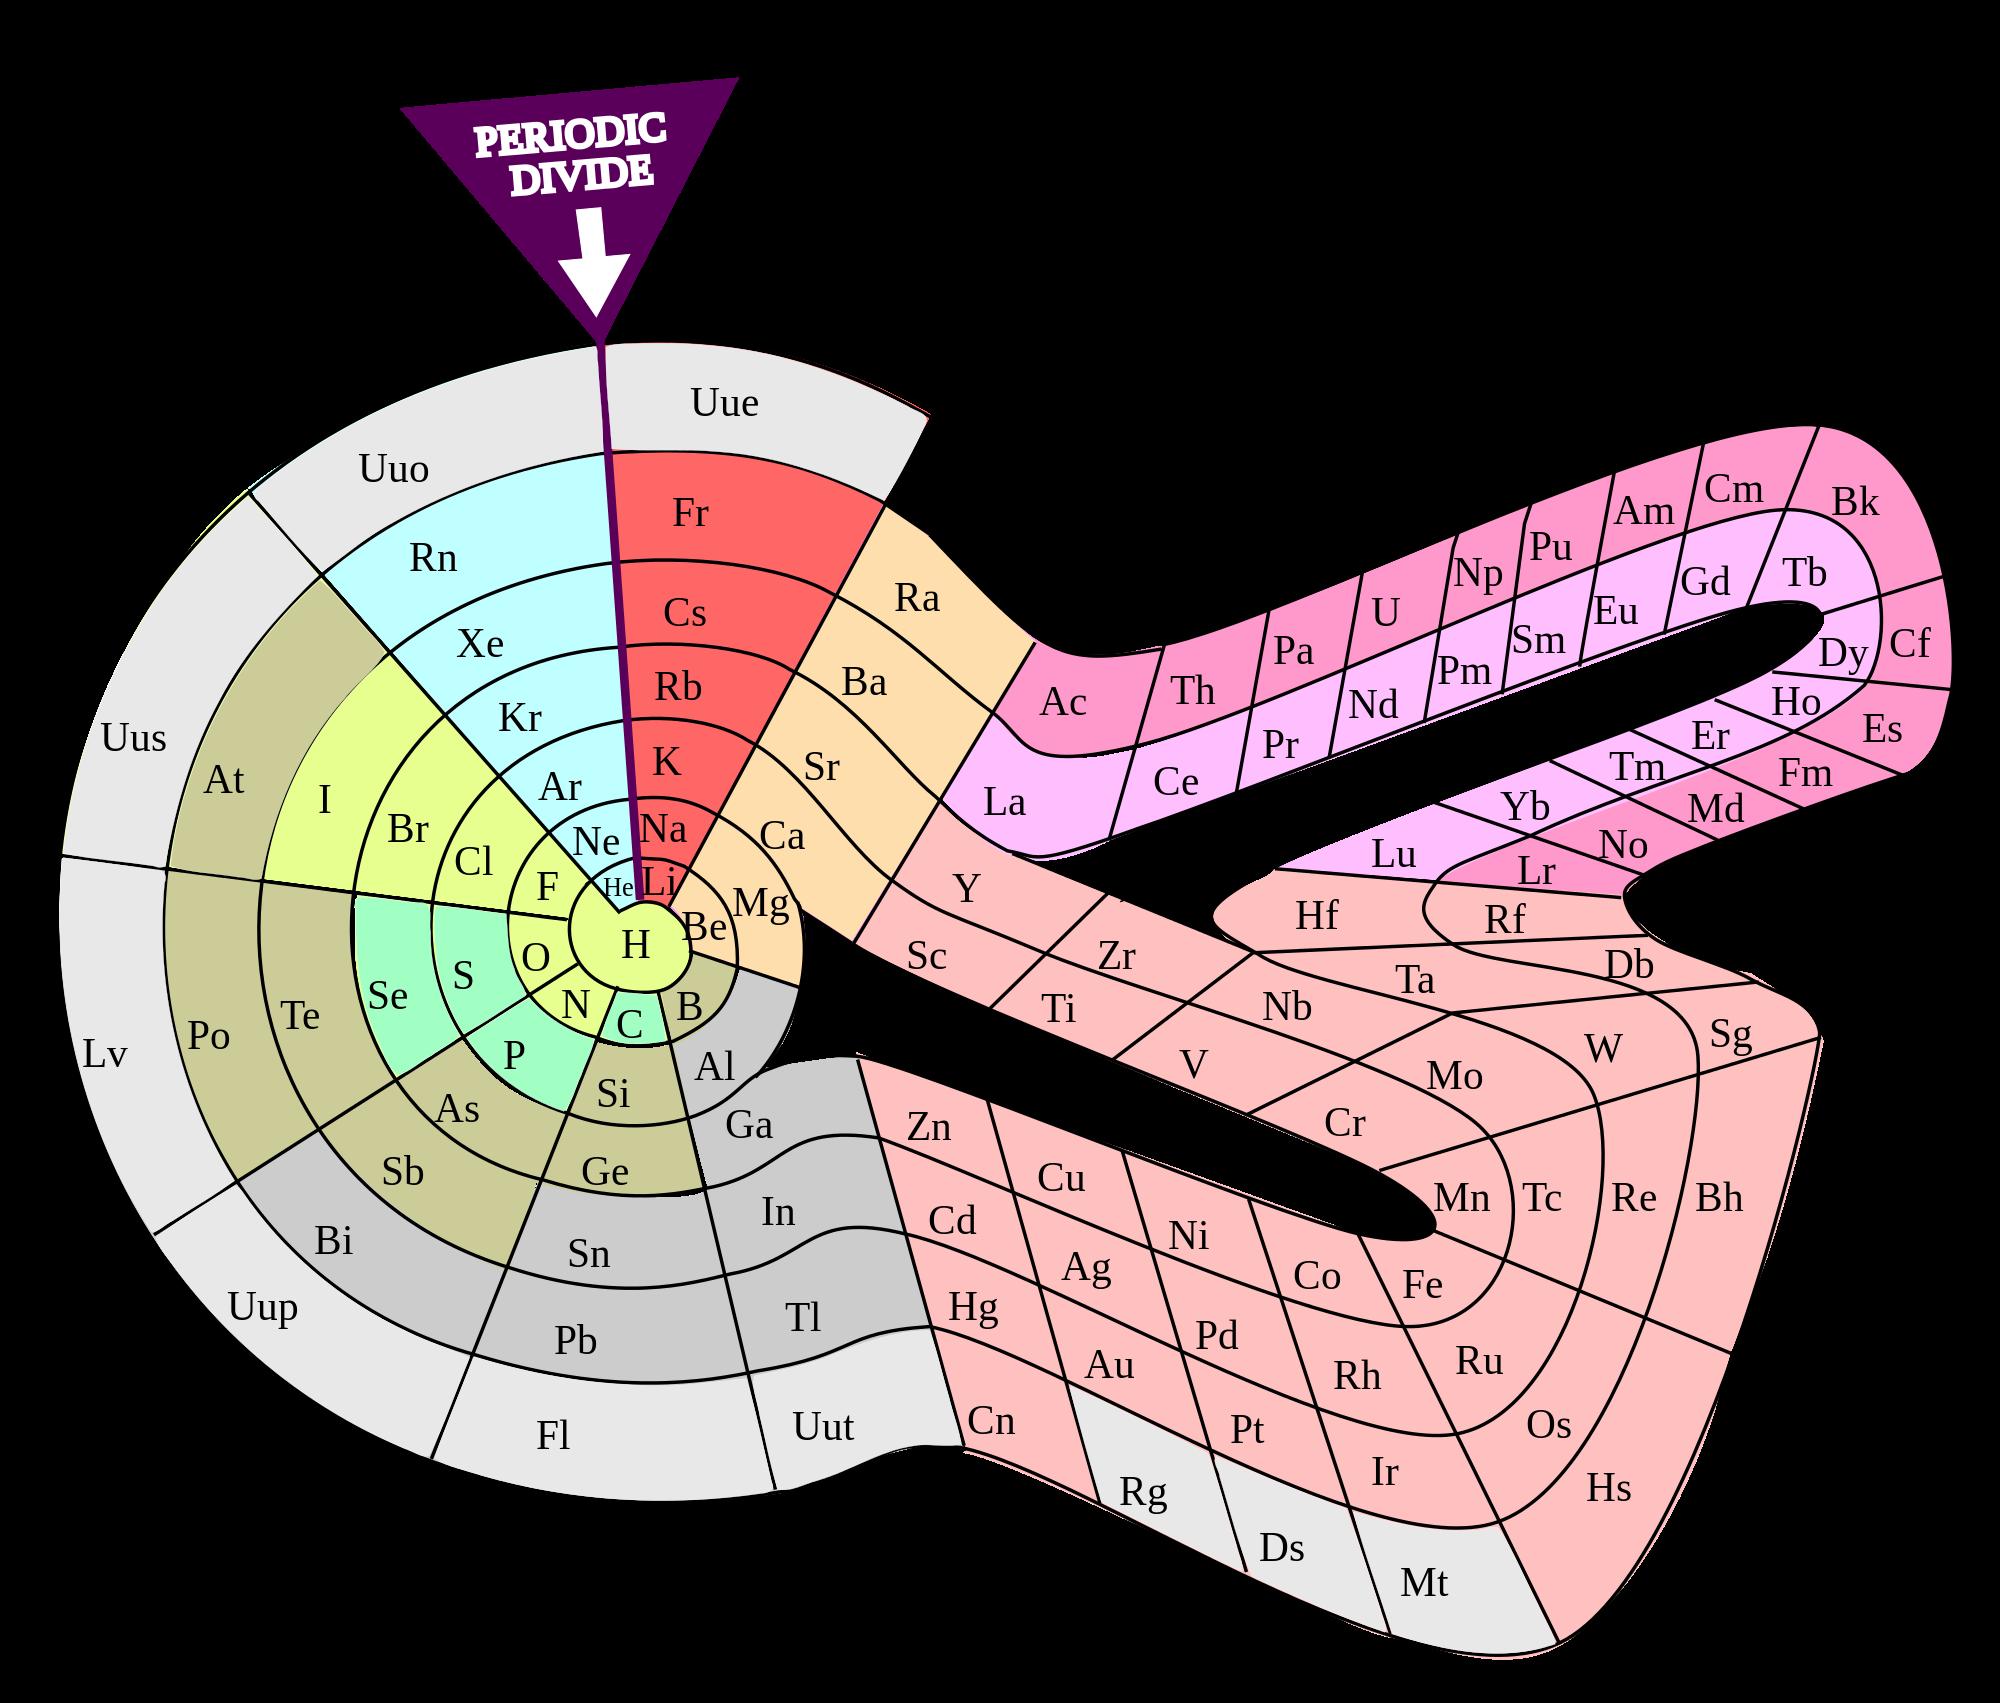 dibujo20160303 theodor benfey spiral periodic table elementspiral polyatomic wikipedia commons